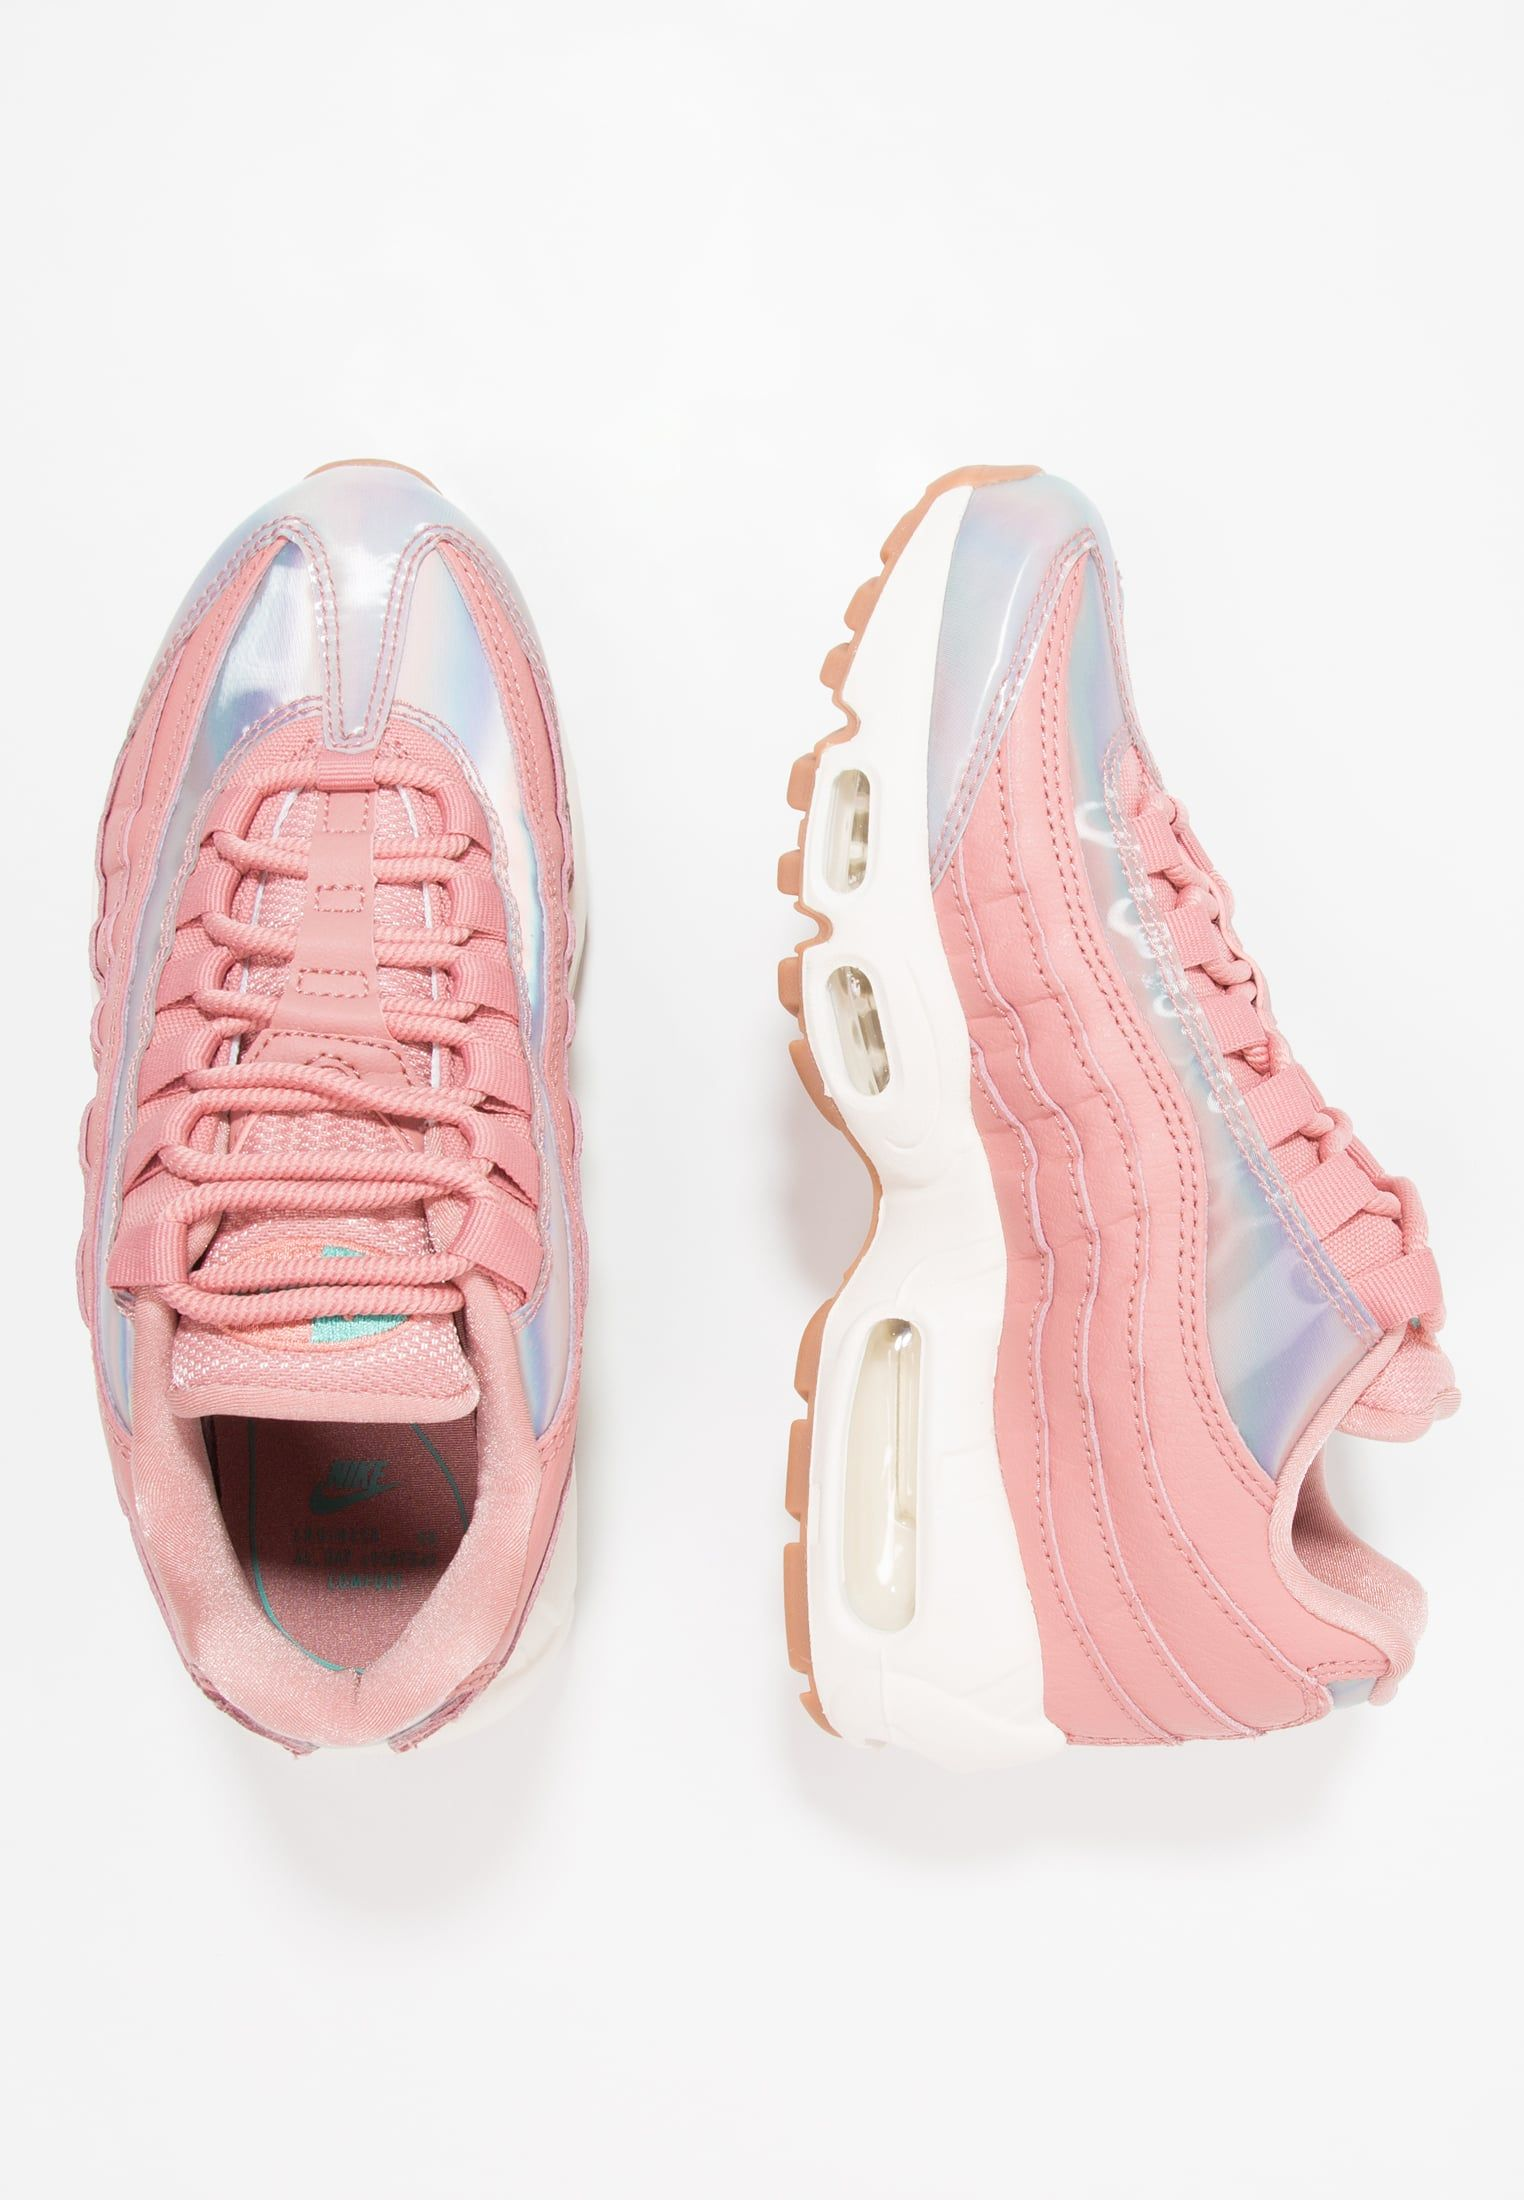 ff89a5aad4b4 Nike Sportswear AIR MAX 95 SE - Baskets basses - red stardust washed  teal sail medium brown - ZALANDO.FR